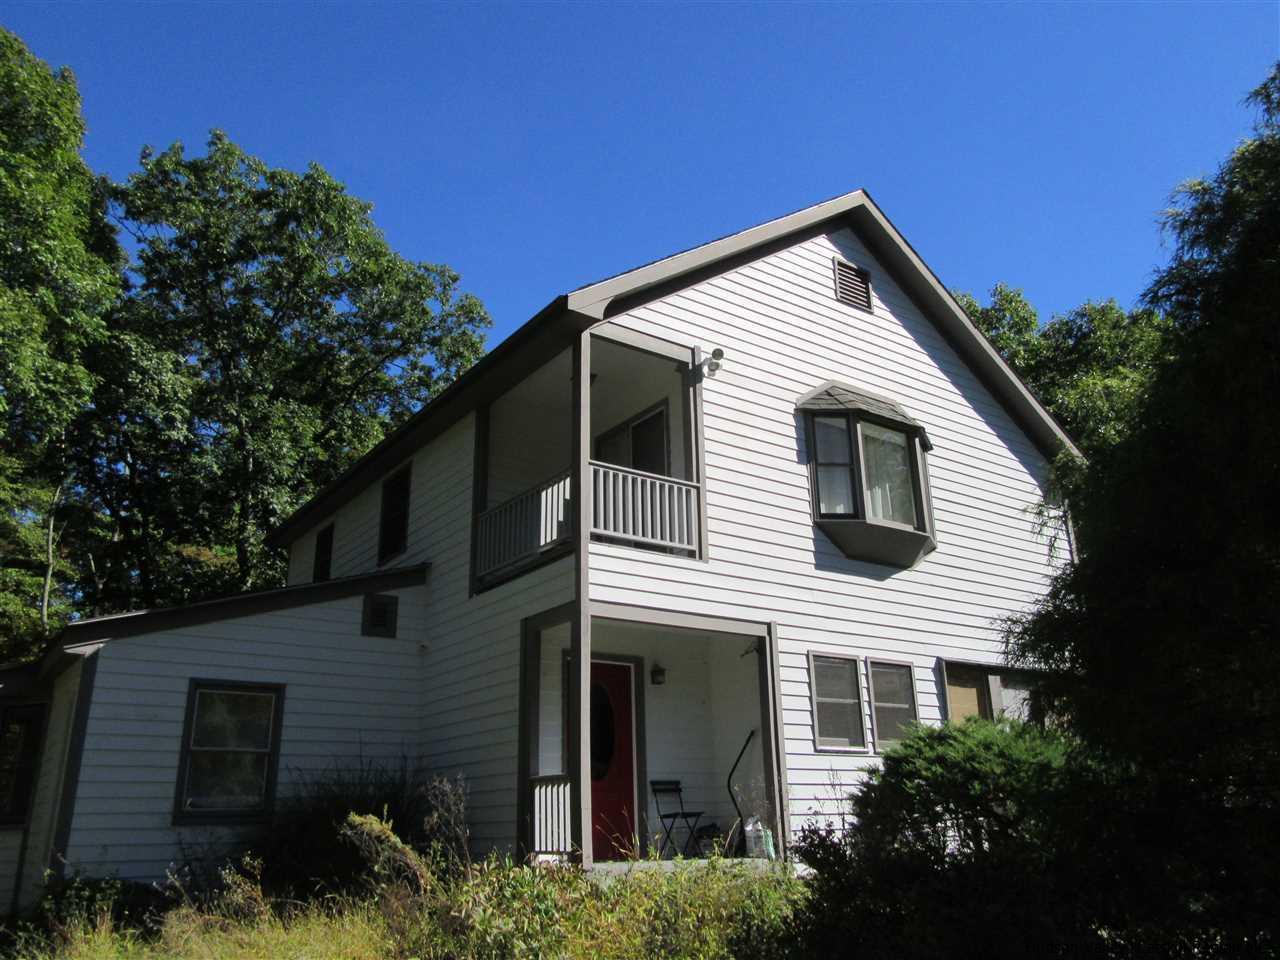 186 Stoll Road, Saugerties, NY 12477